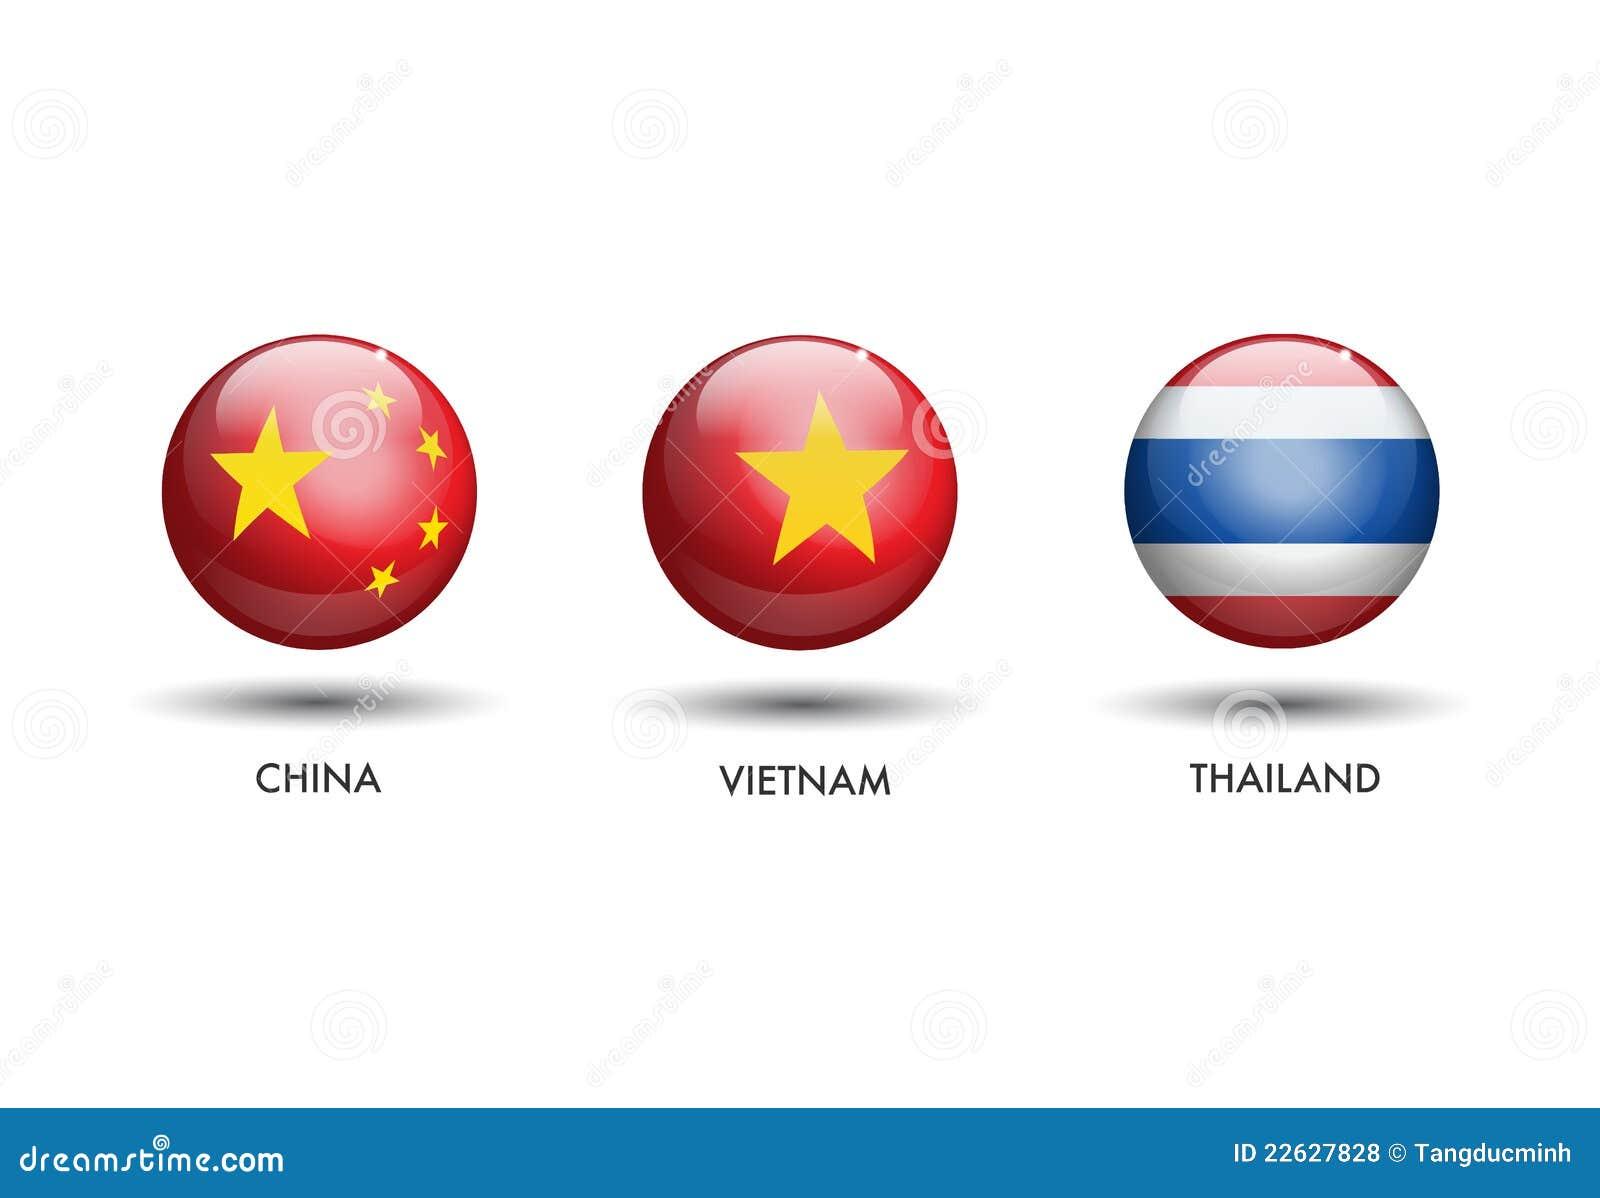 China Vietnam Thailand Flag Royalty Free Stock Photos - Image ...